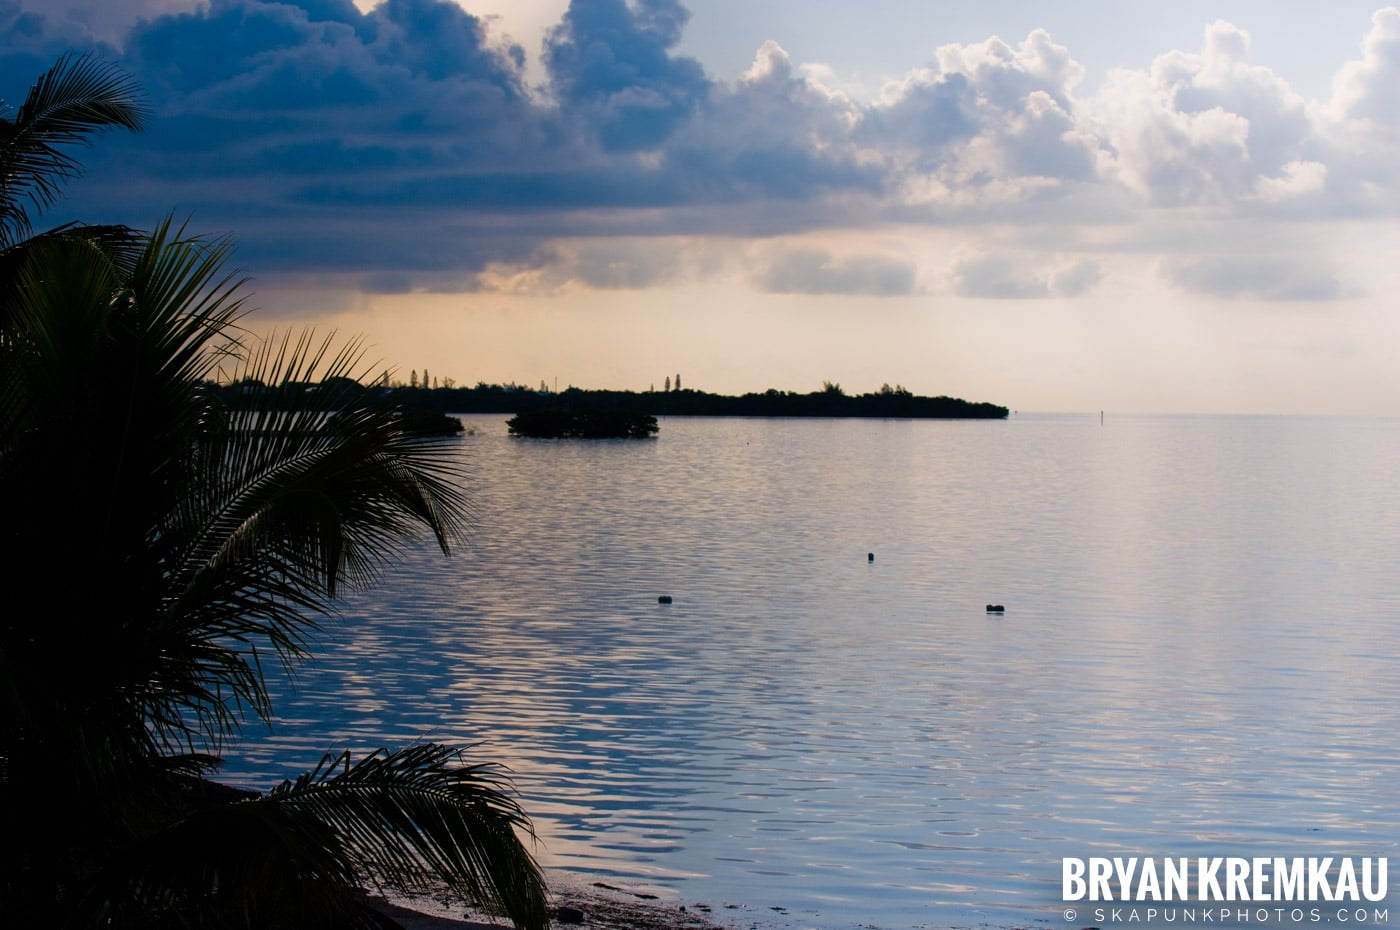 Florida Keys Vacation - 7.09.10 - 7.15.10 (65)